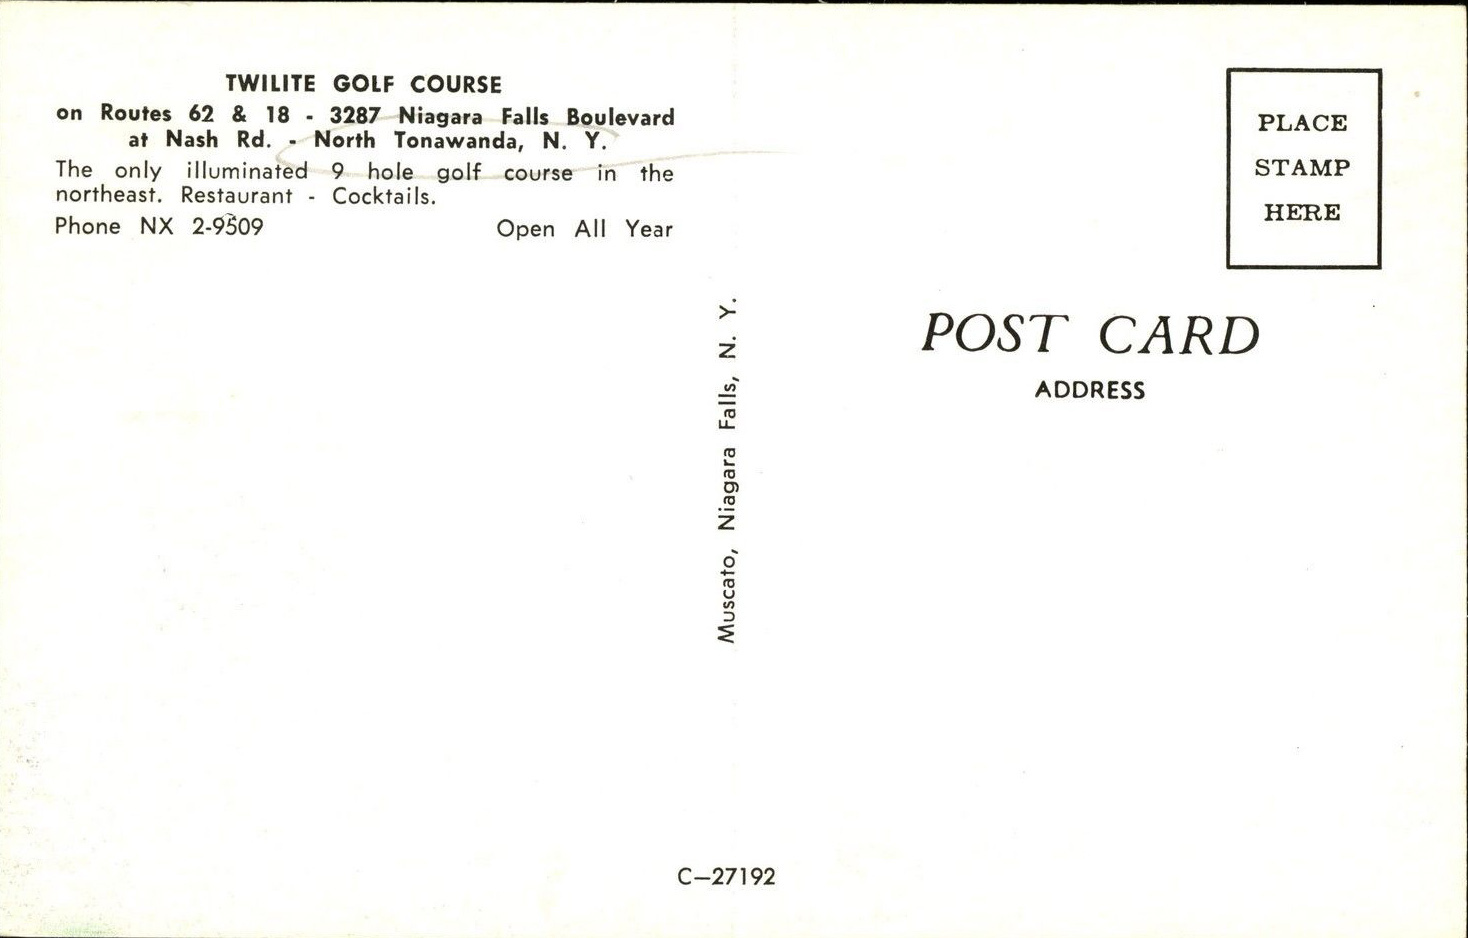 Twilite Golf Course, 3287 Niag Falls Blvd, postcard reverse (c1960).jpg